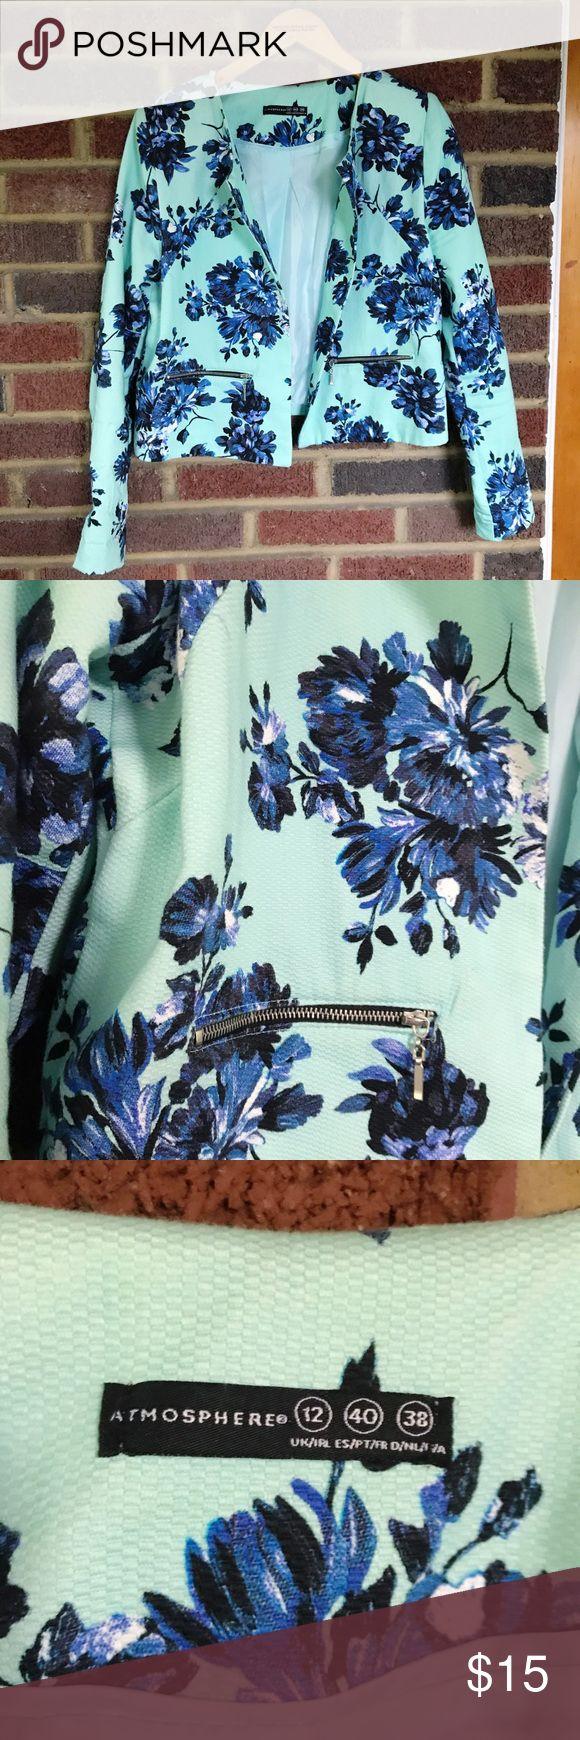 Primark Atmosphere Floral Light Blue Blazer Light blue floral blazer from Primark. UK 12 which fits US 4 or 6 Atmosphere Jackets & Coats Blazers